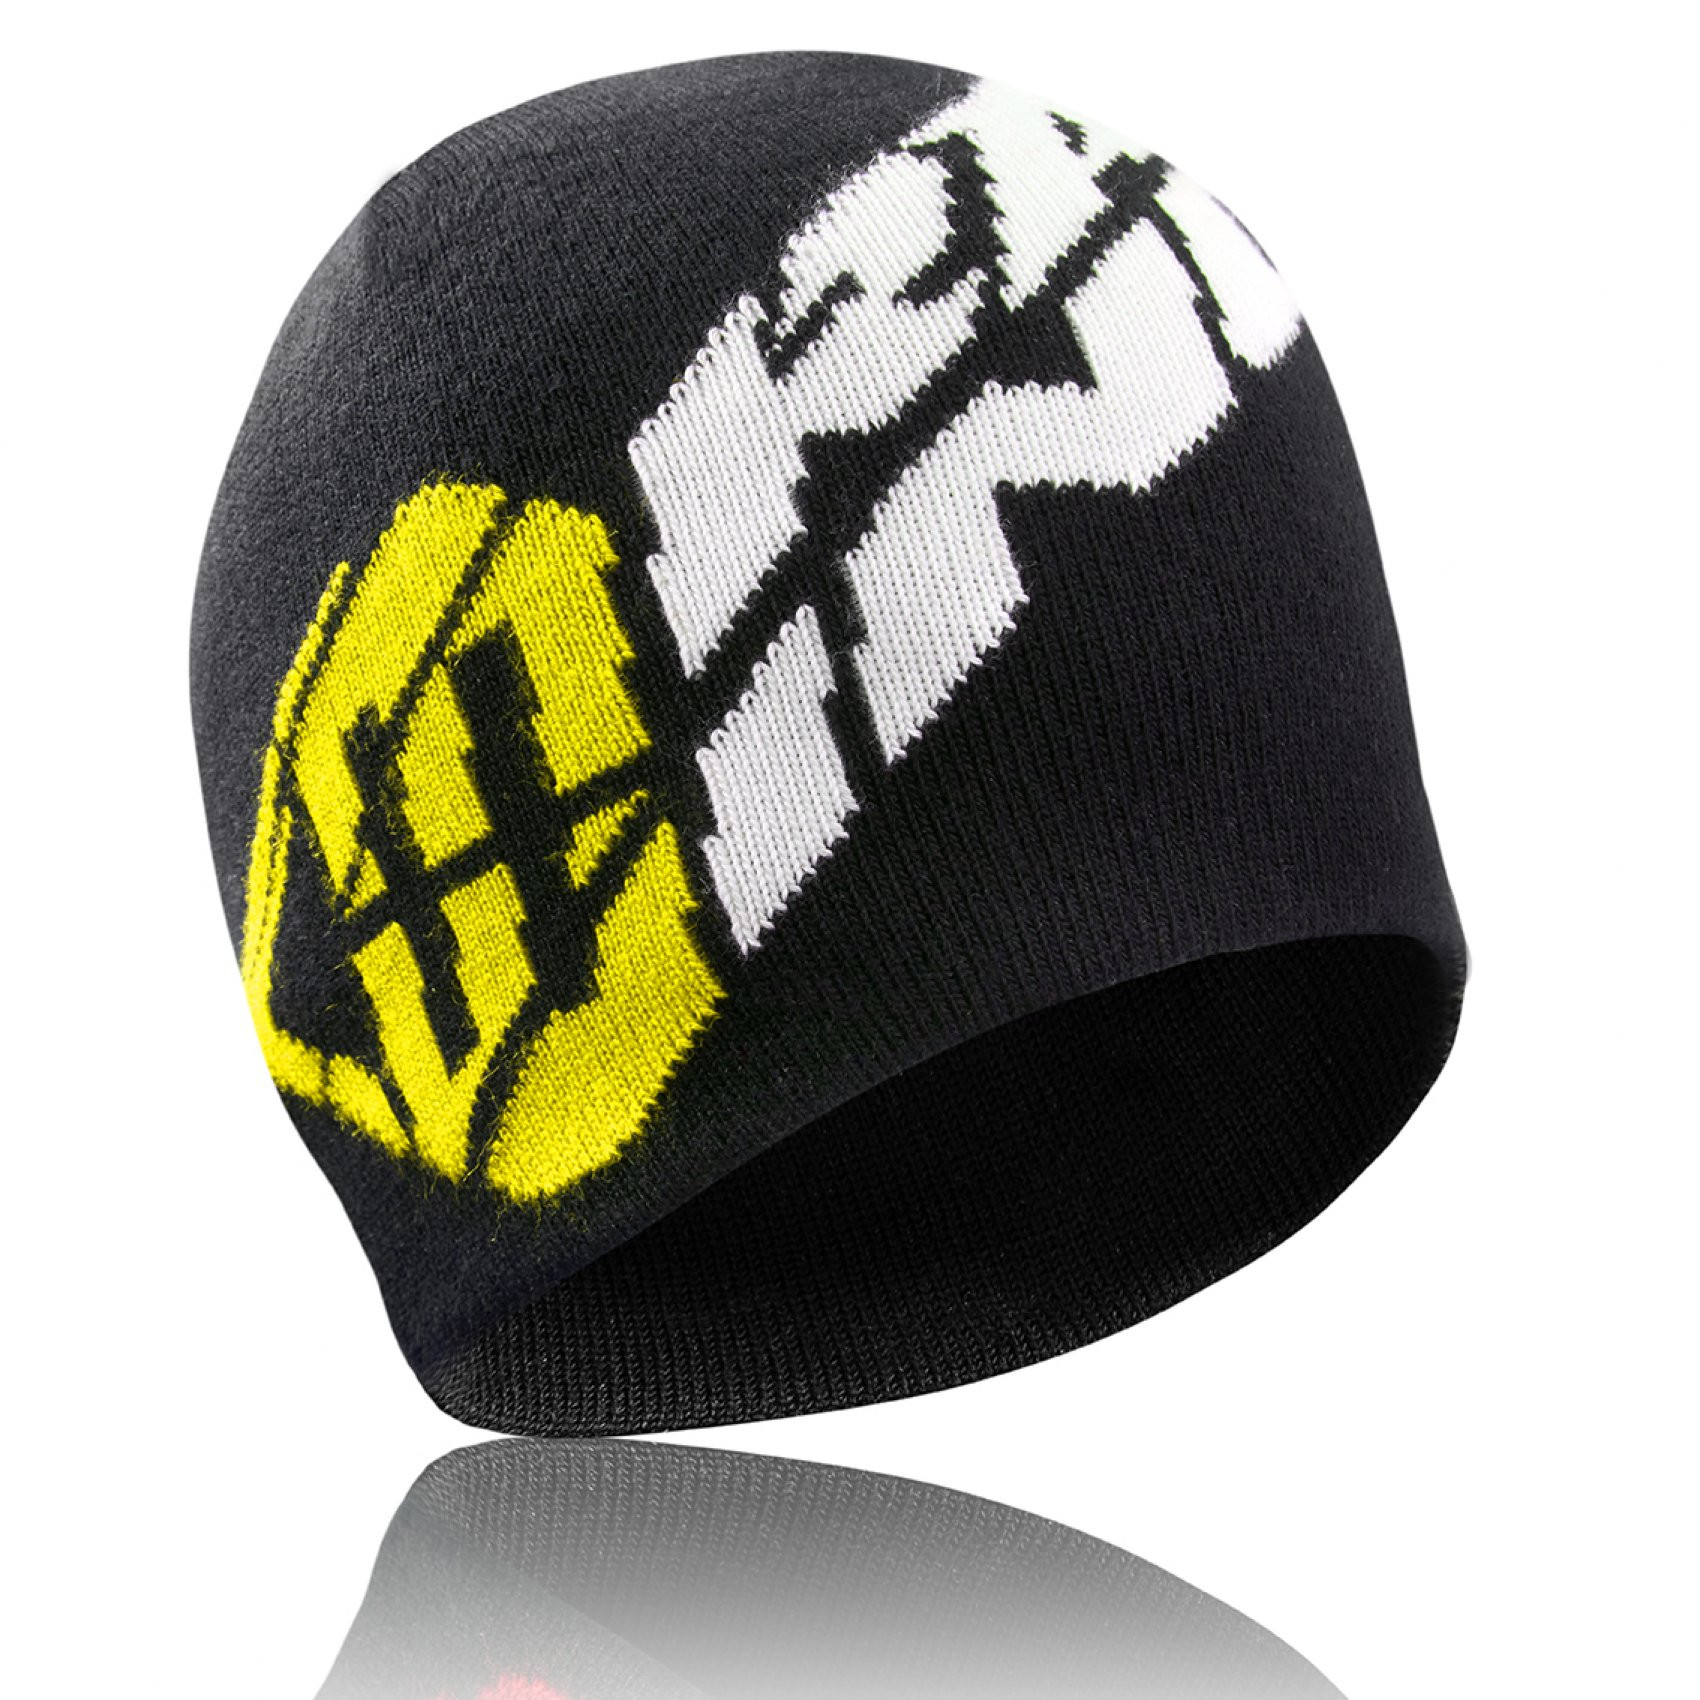 Bonnet homme racing logo jaune (photo)